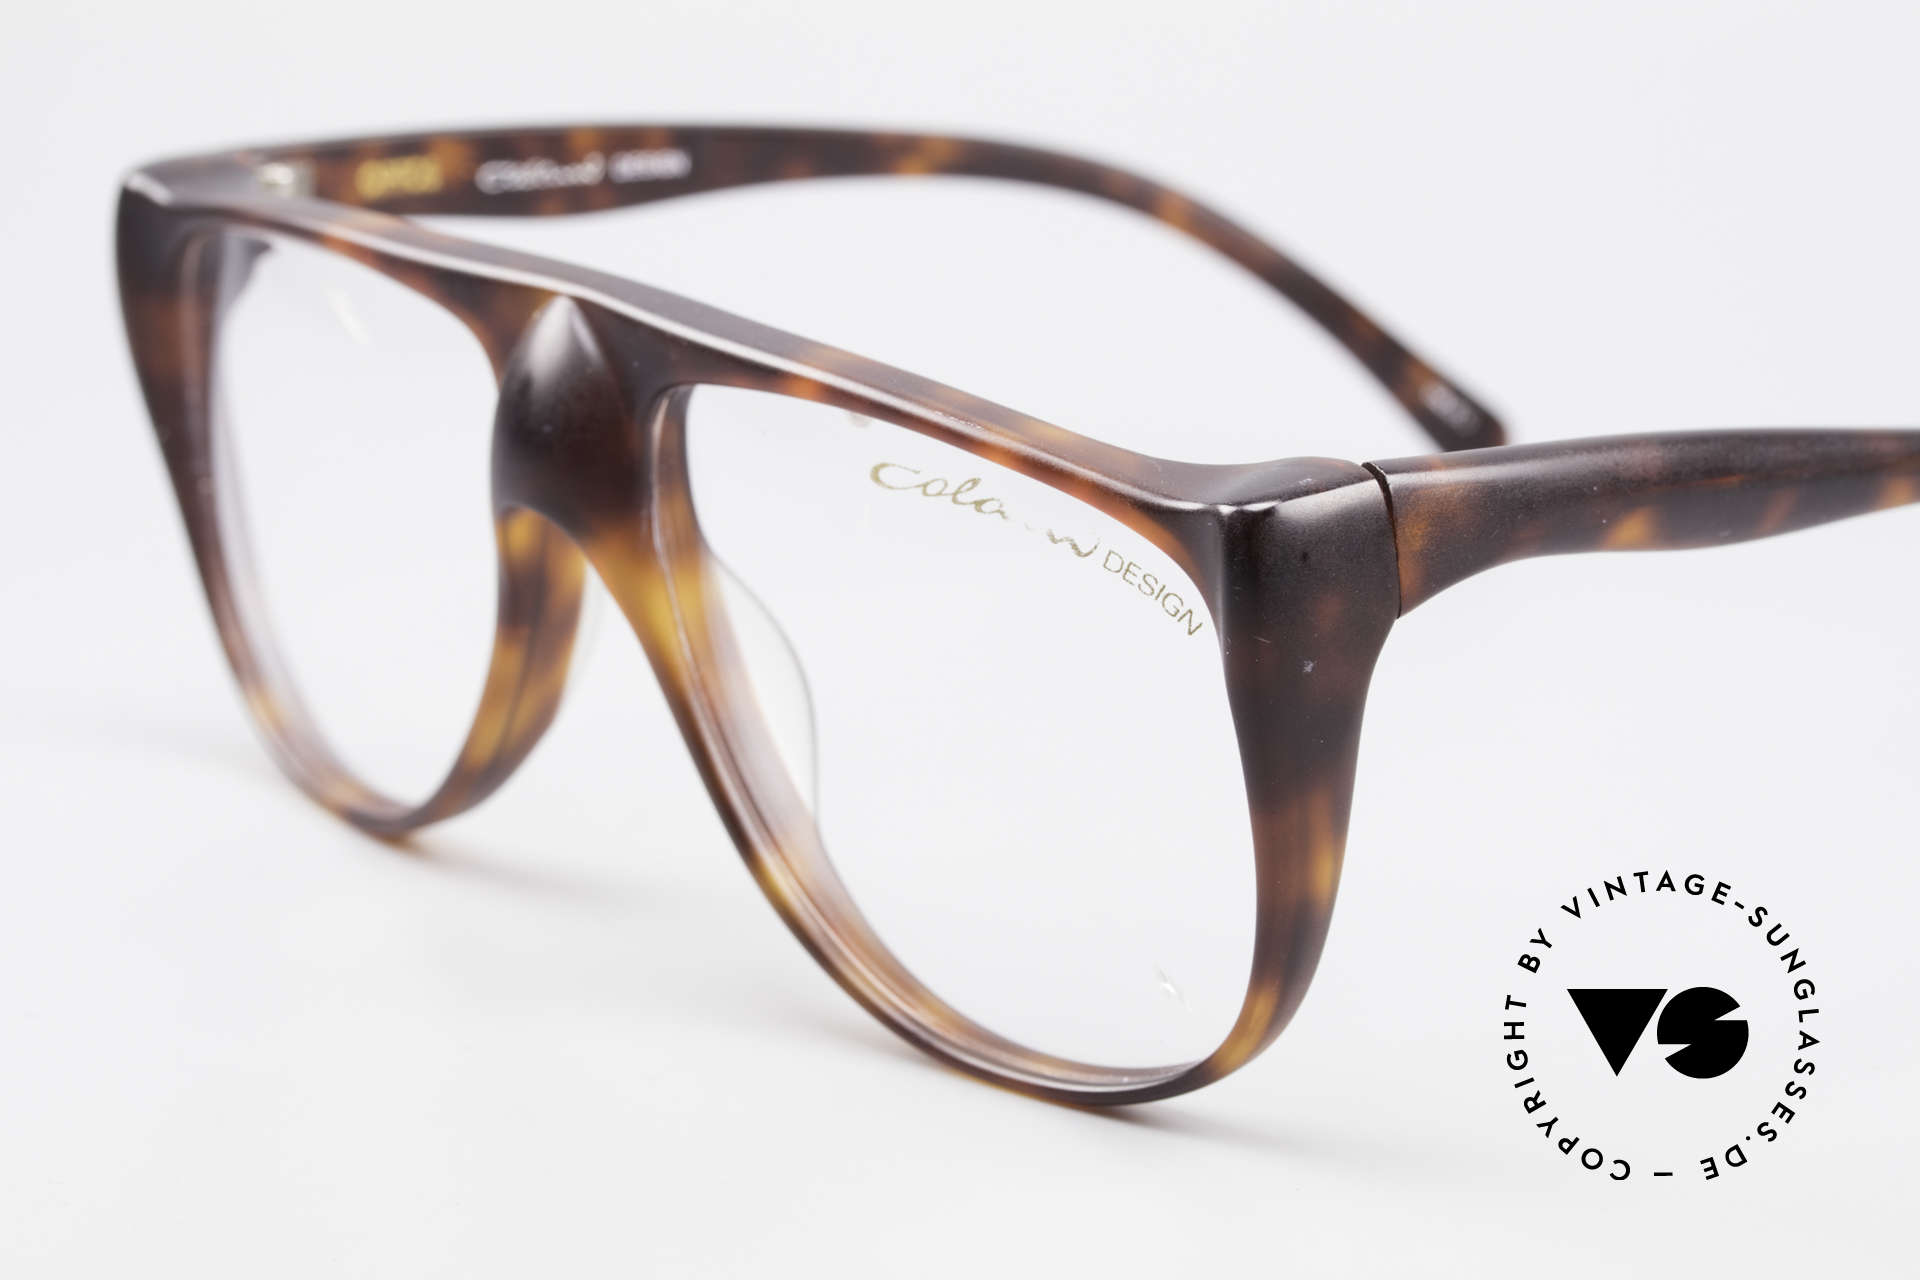 Colani 15-331 Extraordinary Vintage Frame, unworn (like all our rare vintage COLANI eyeglasses), Made for Men